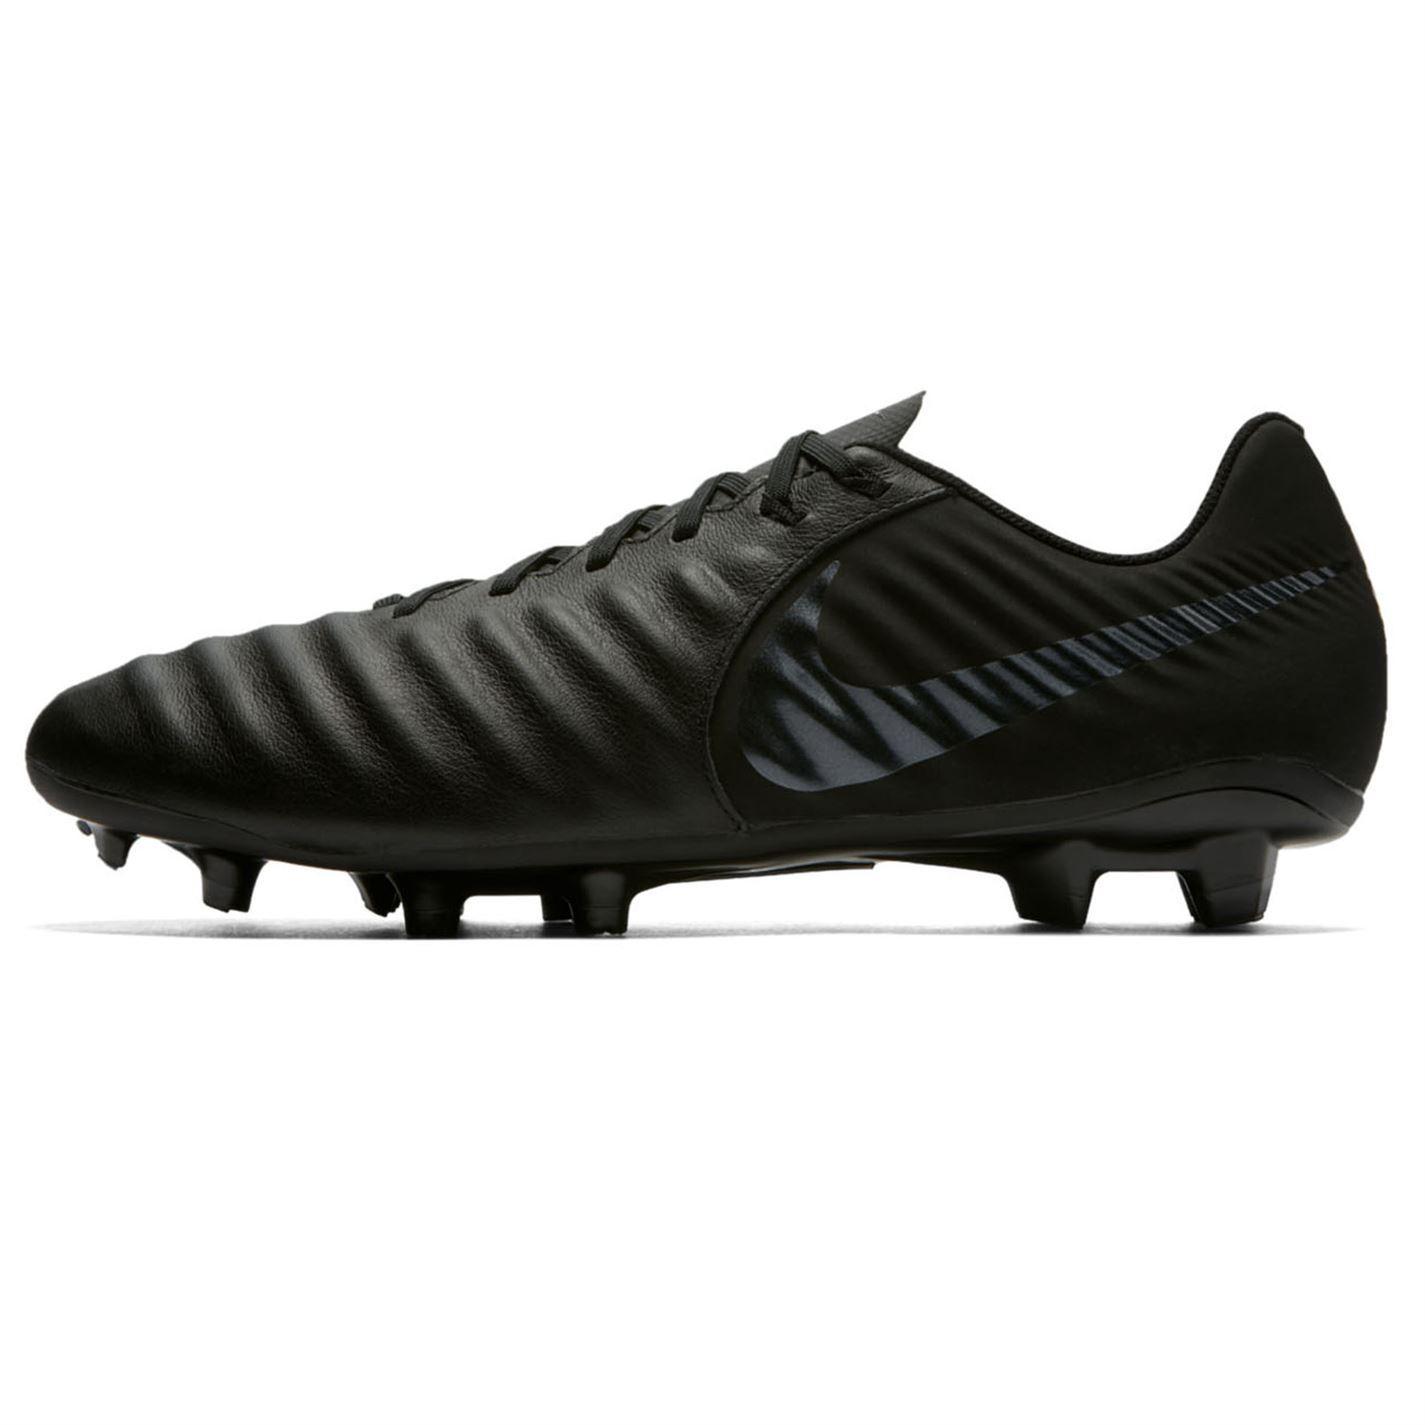 Nike-Tiempo-Legend-Academy-FG-Firm-Ground-Chaussures-De-Football-Homme-Football-Chaussures-Crampons miniature 7